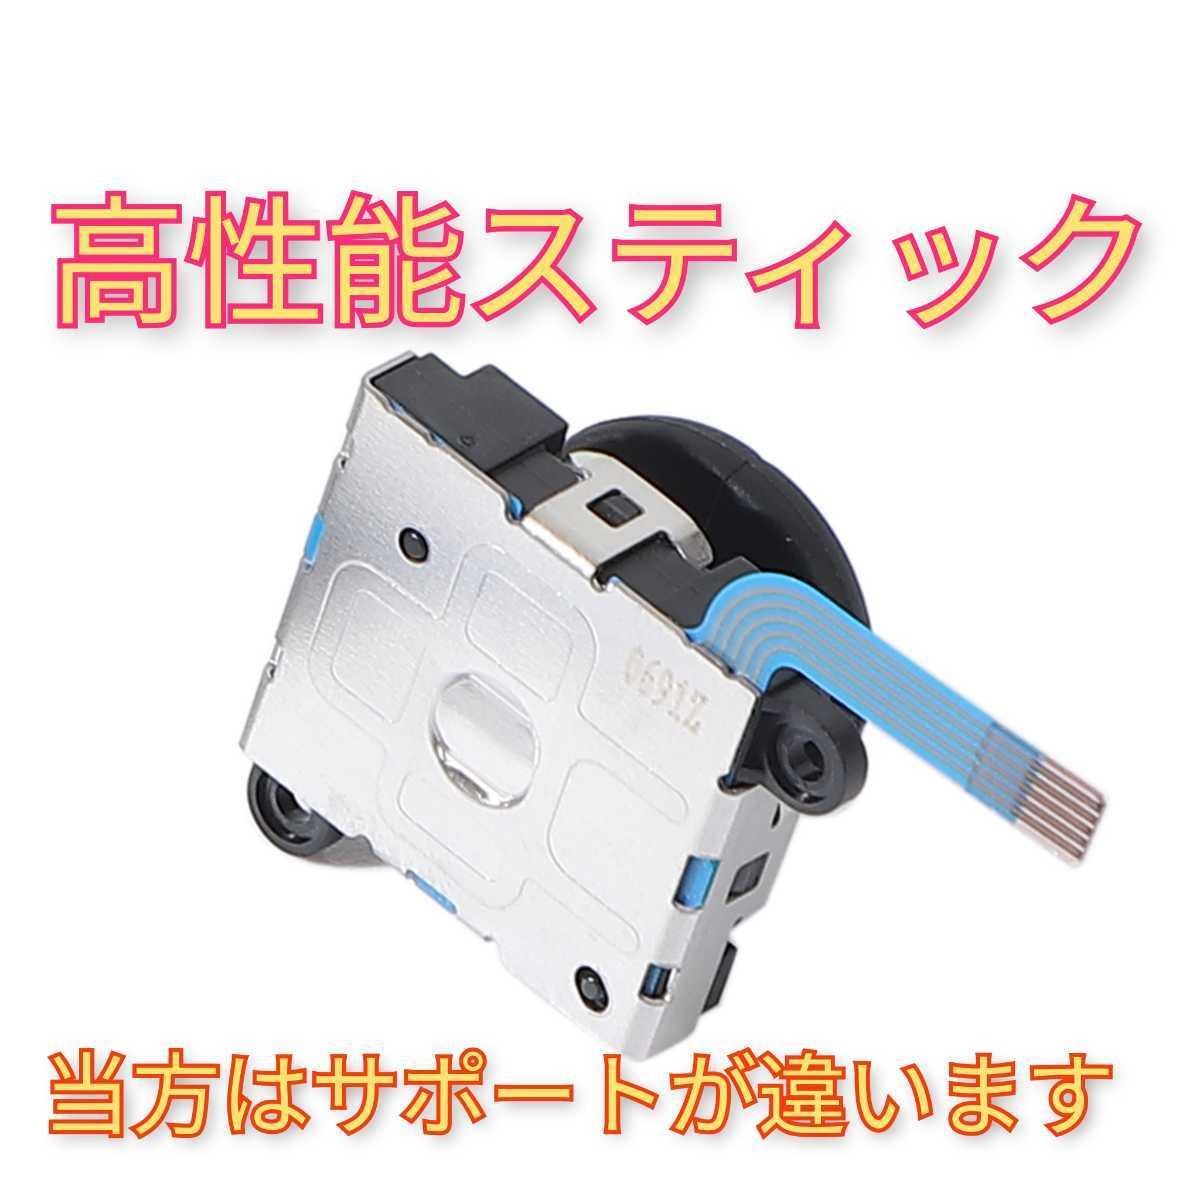 Nintendo Switch Joy-Con ジョイコン 修理キット大人気商品高性能アナログスティック